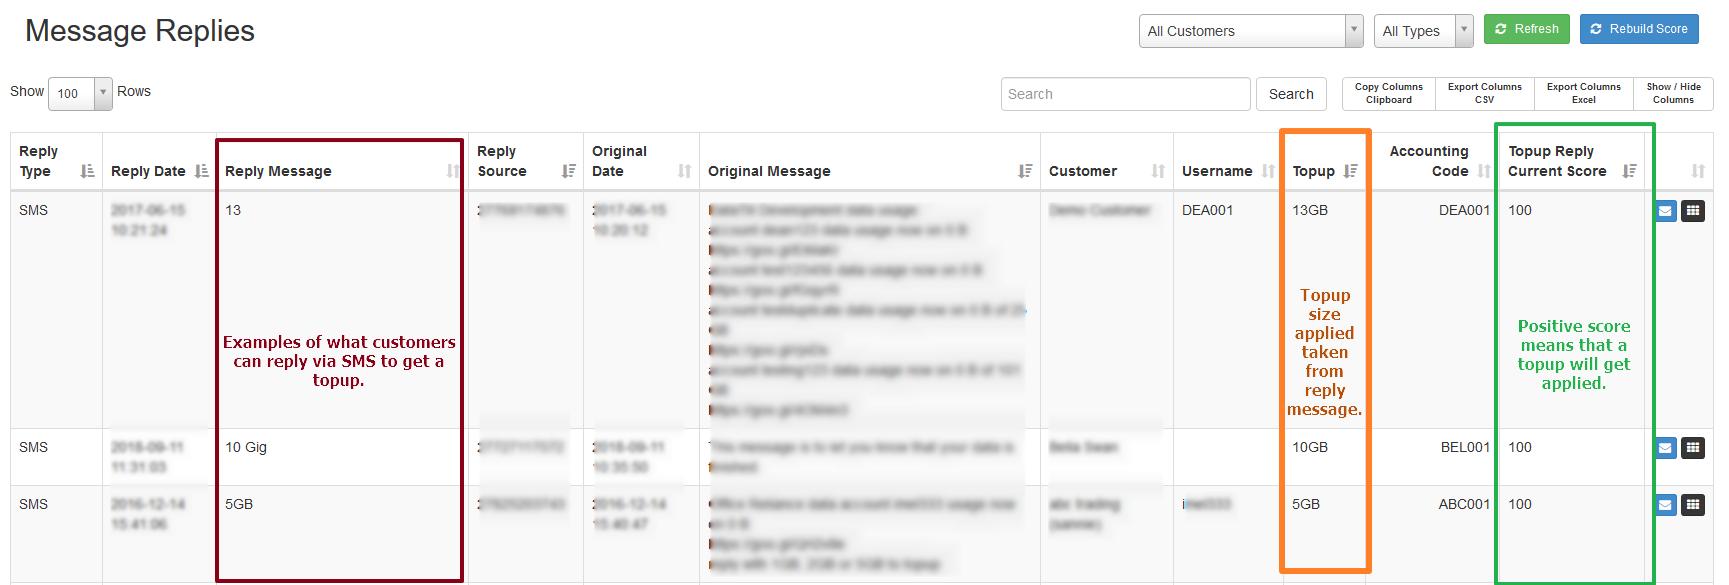 sms topup replies generate topups